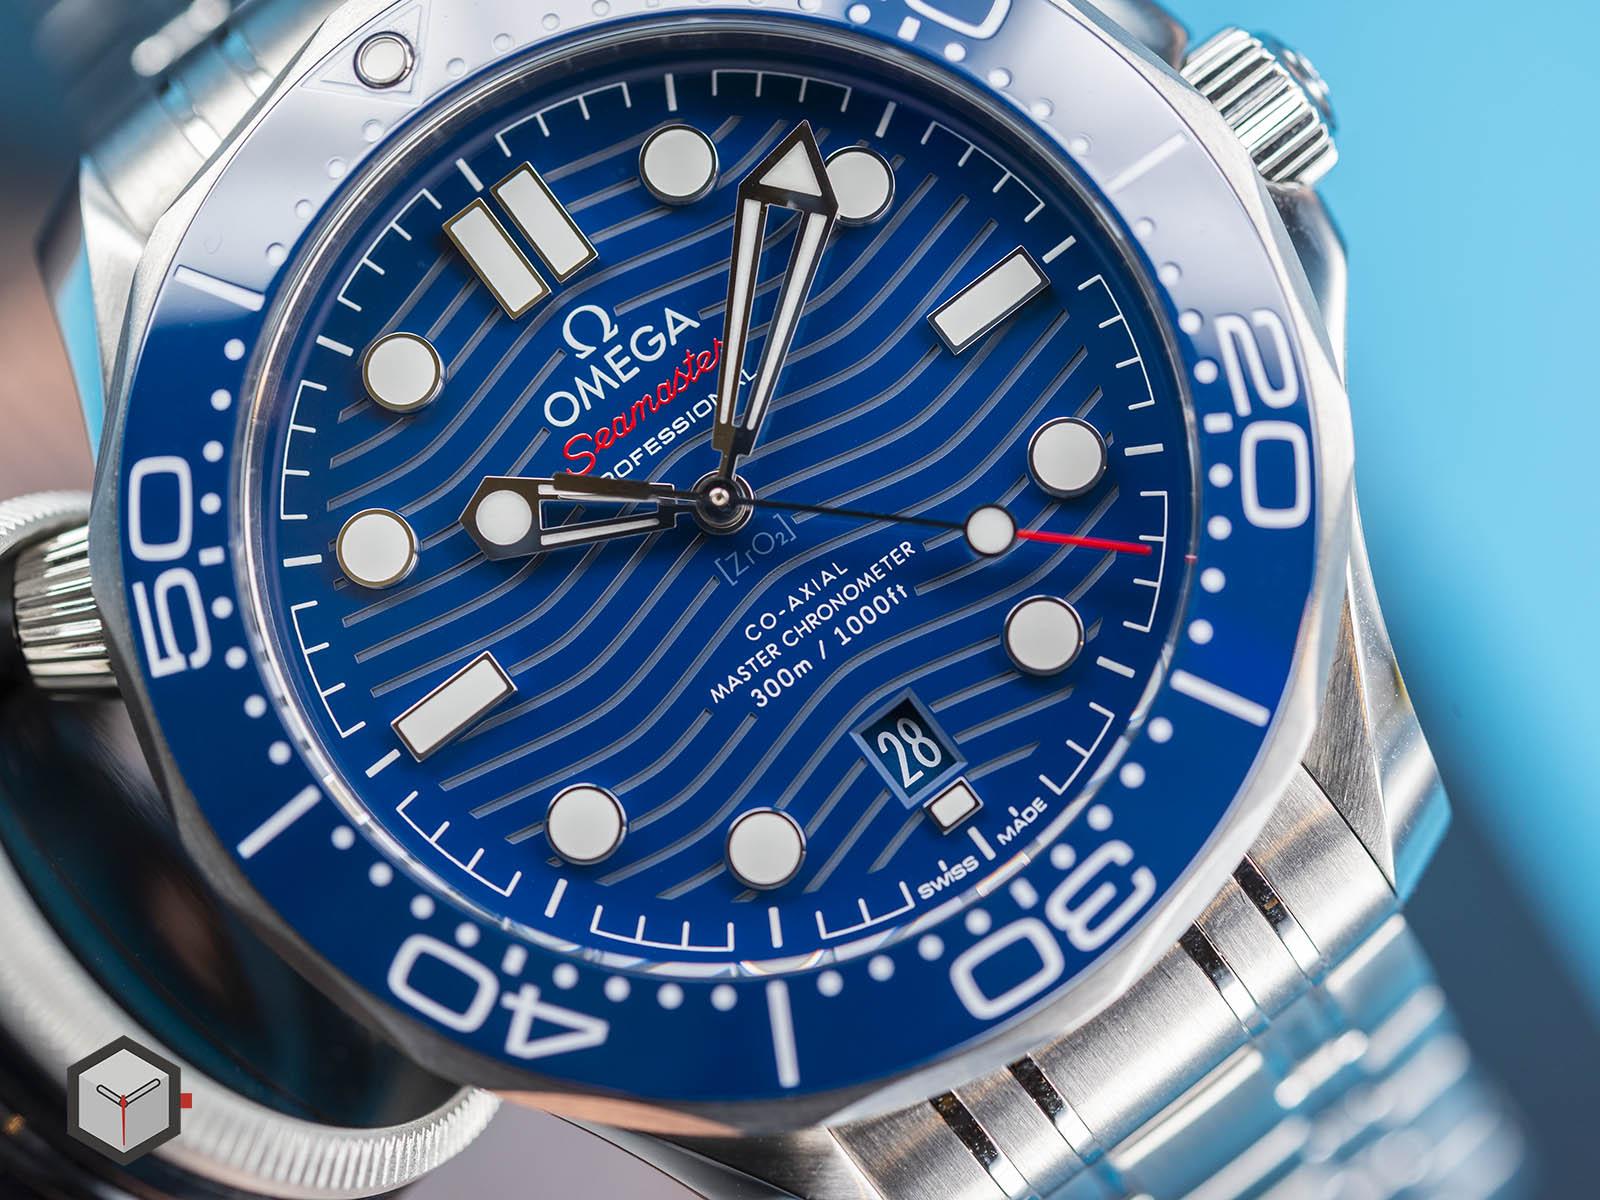 210-30-42-20-03-001-omega-seamaster-professional-diver-300m-4.jpg